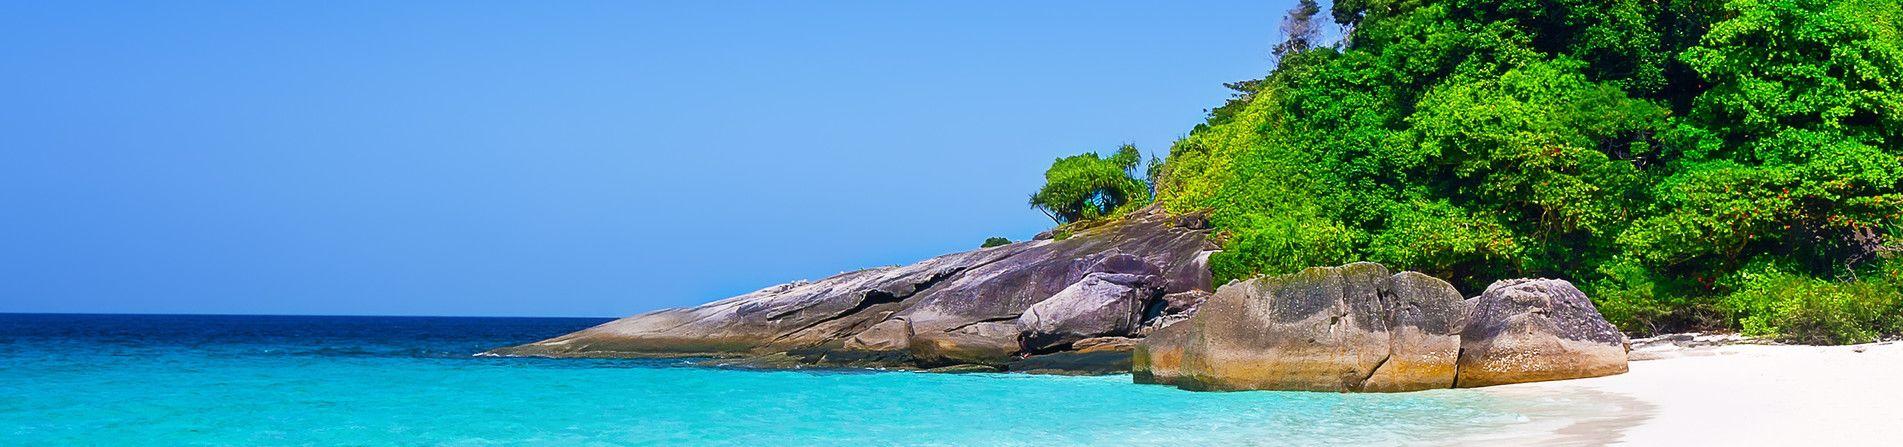 Îles Caribéennes